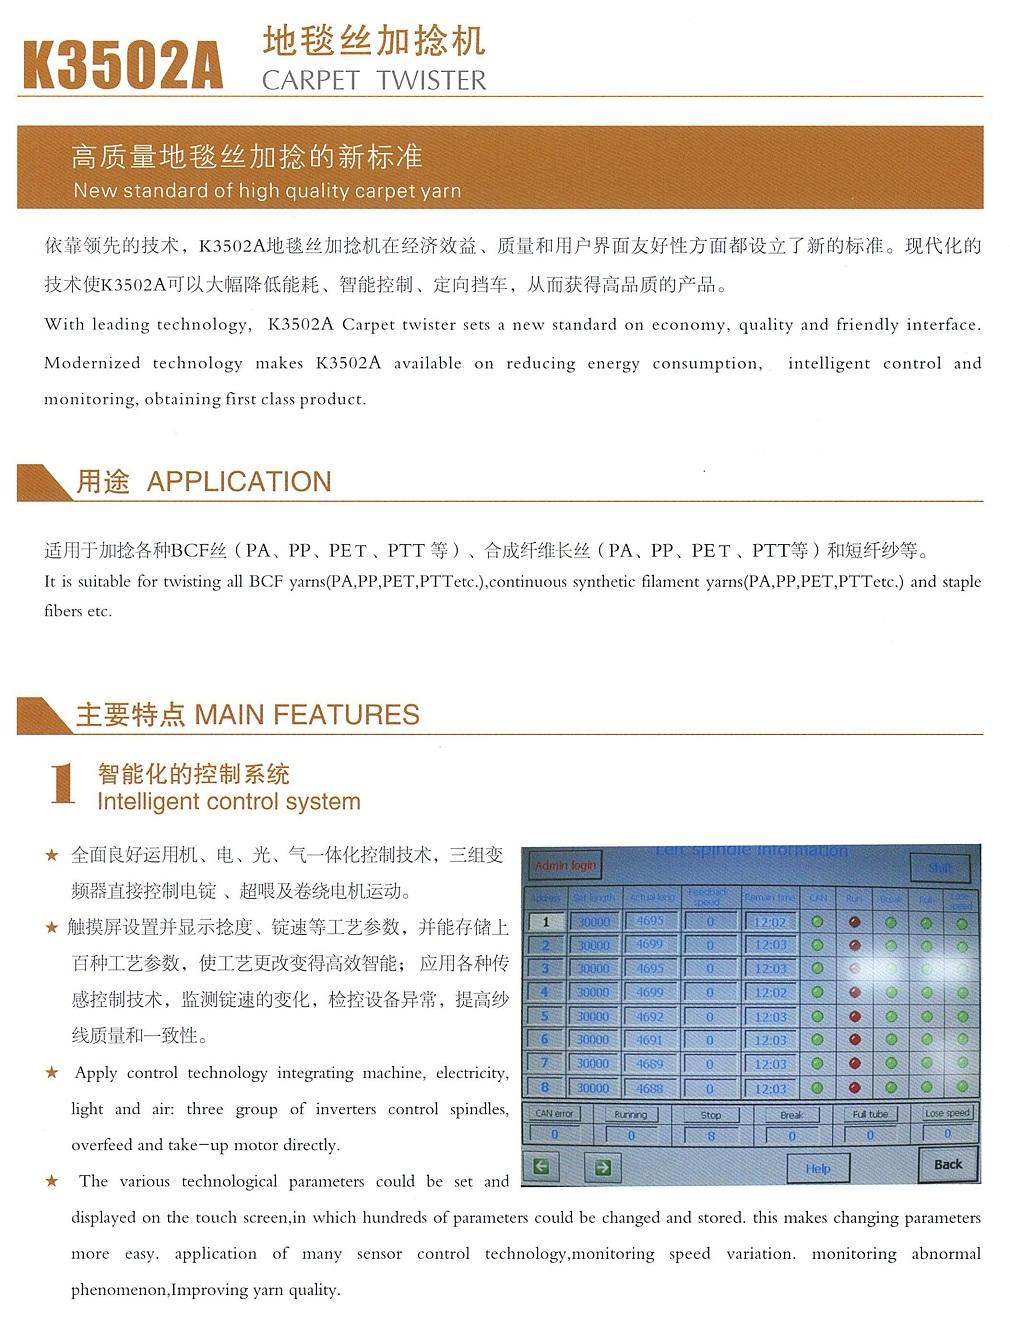 K3502A產品詳情二